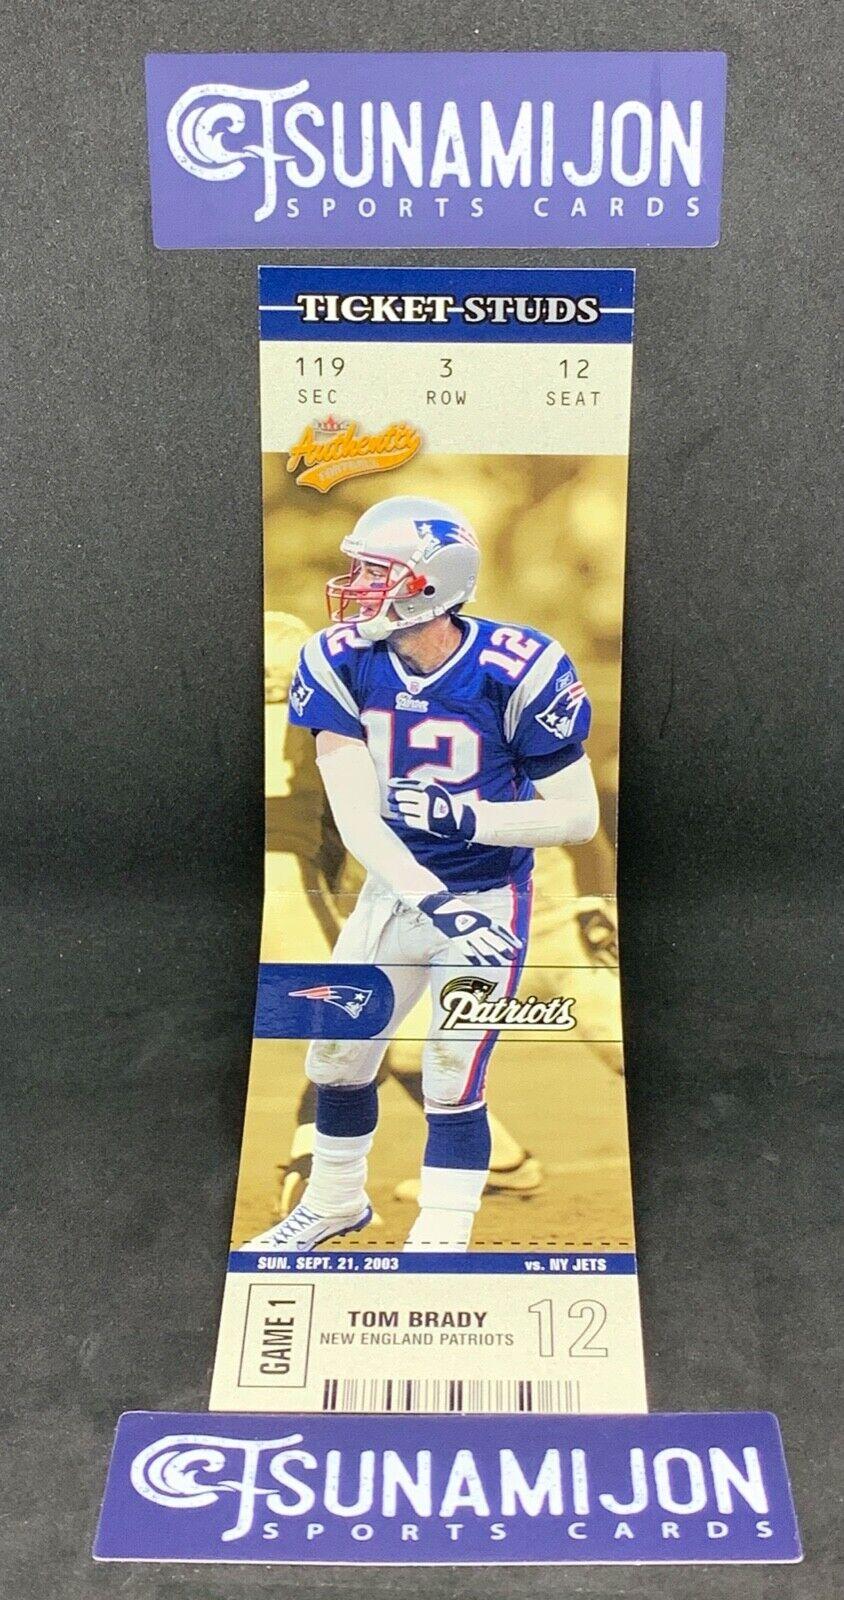 2003 Fleer Authentix Ticket Studs #2TS Tom Brady New England Patriots